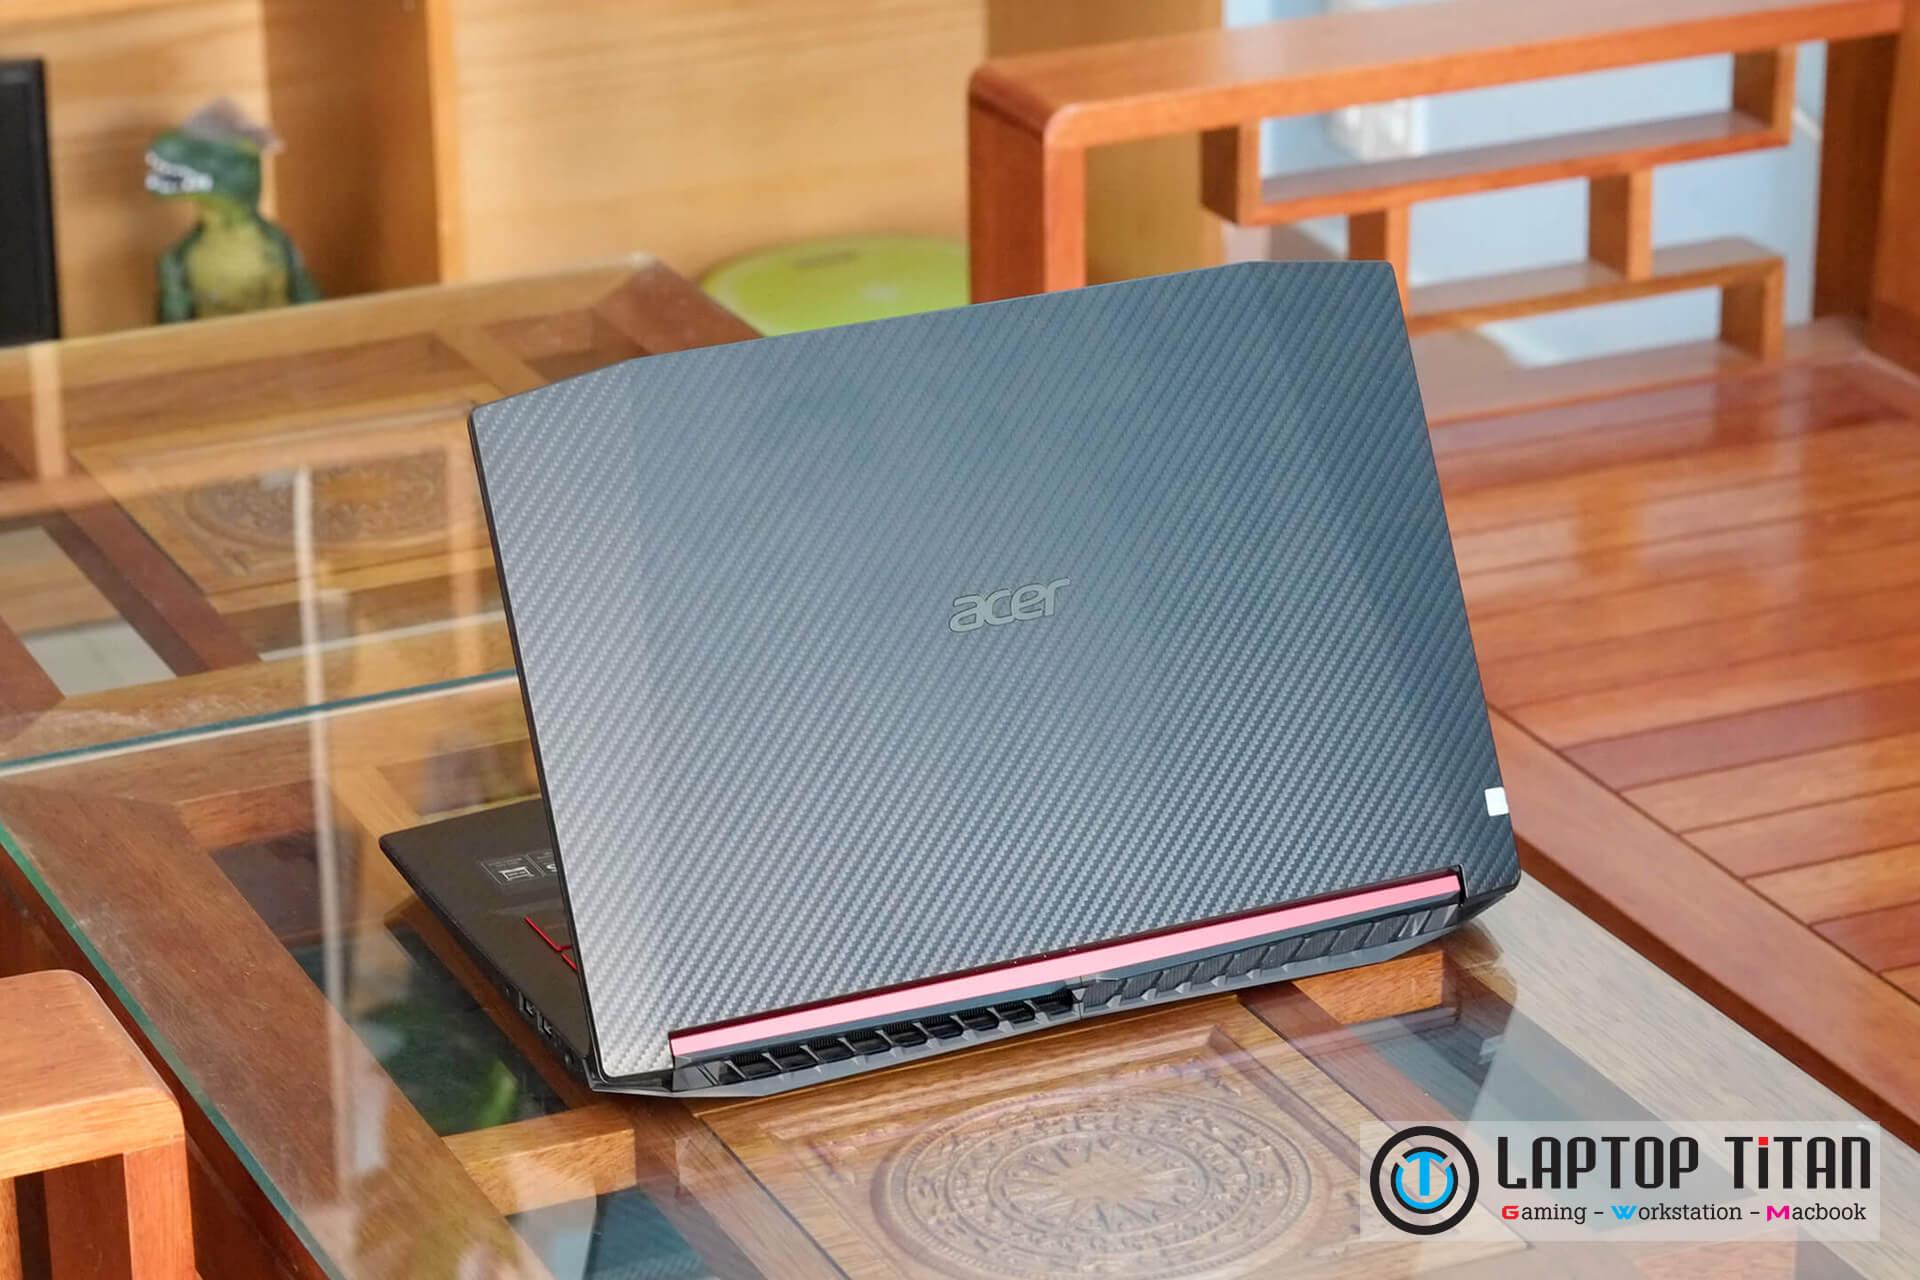 "Acer Nitro 5 Core i7 8750H / 8GB / 128GB + 1TB / GTX 1050Ti 4GB / 15.6"" FHD IPS"